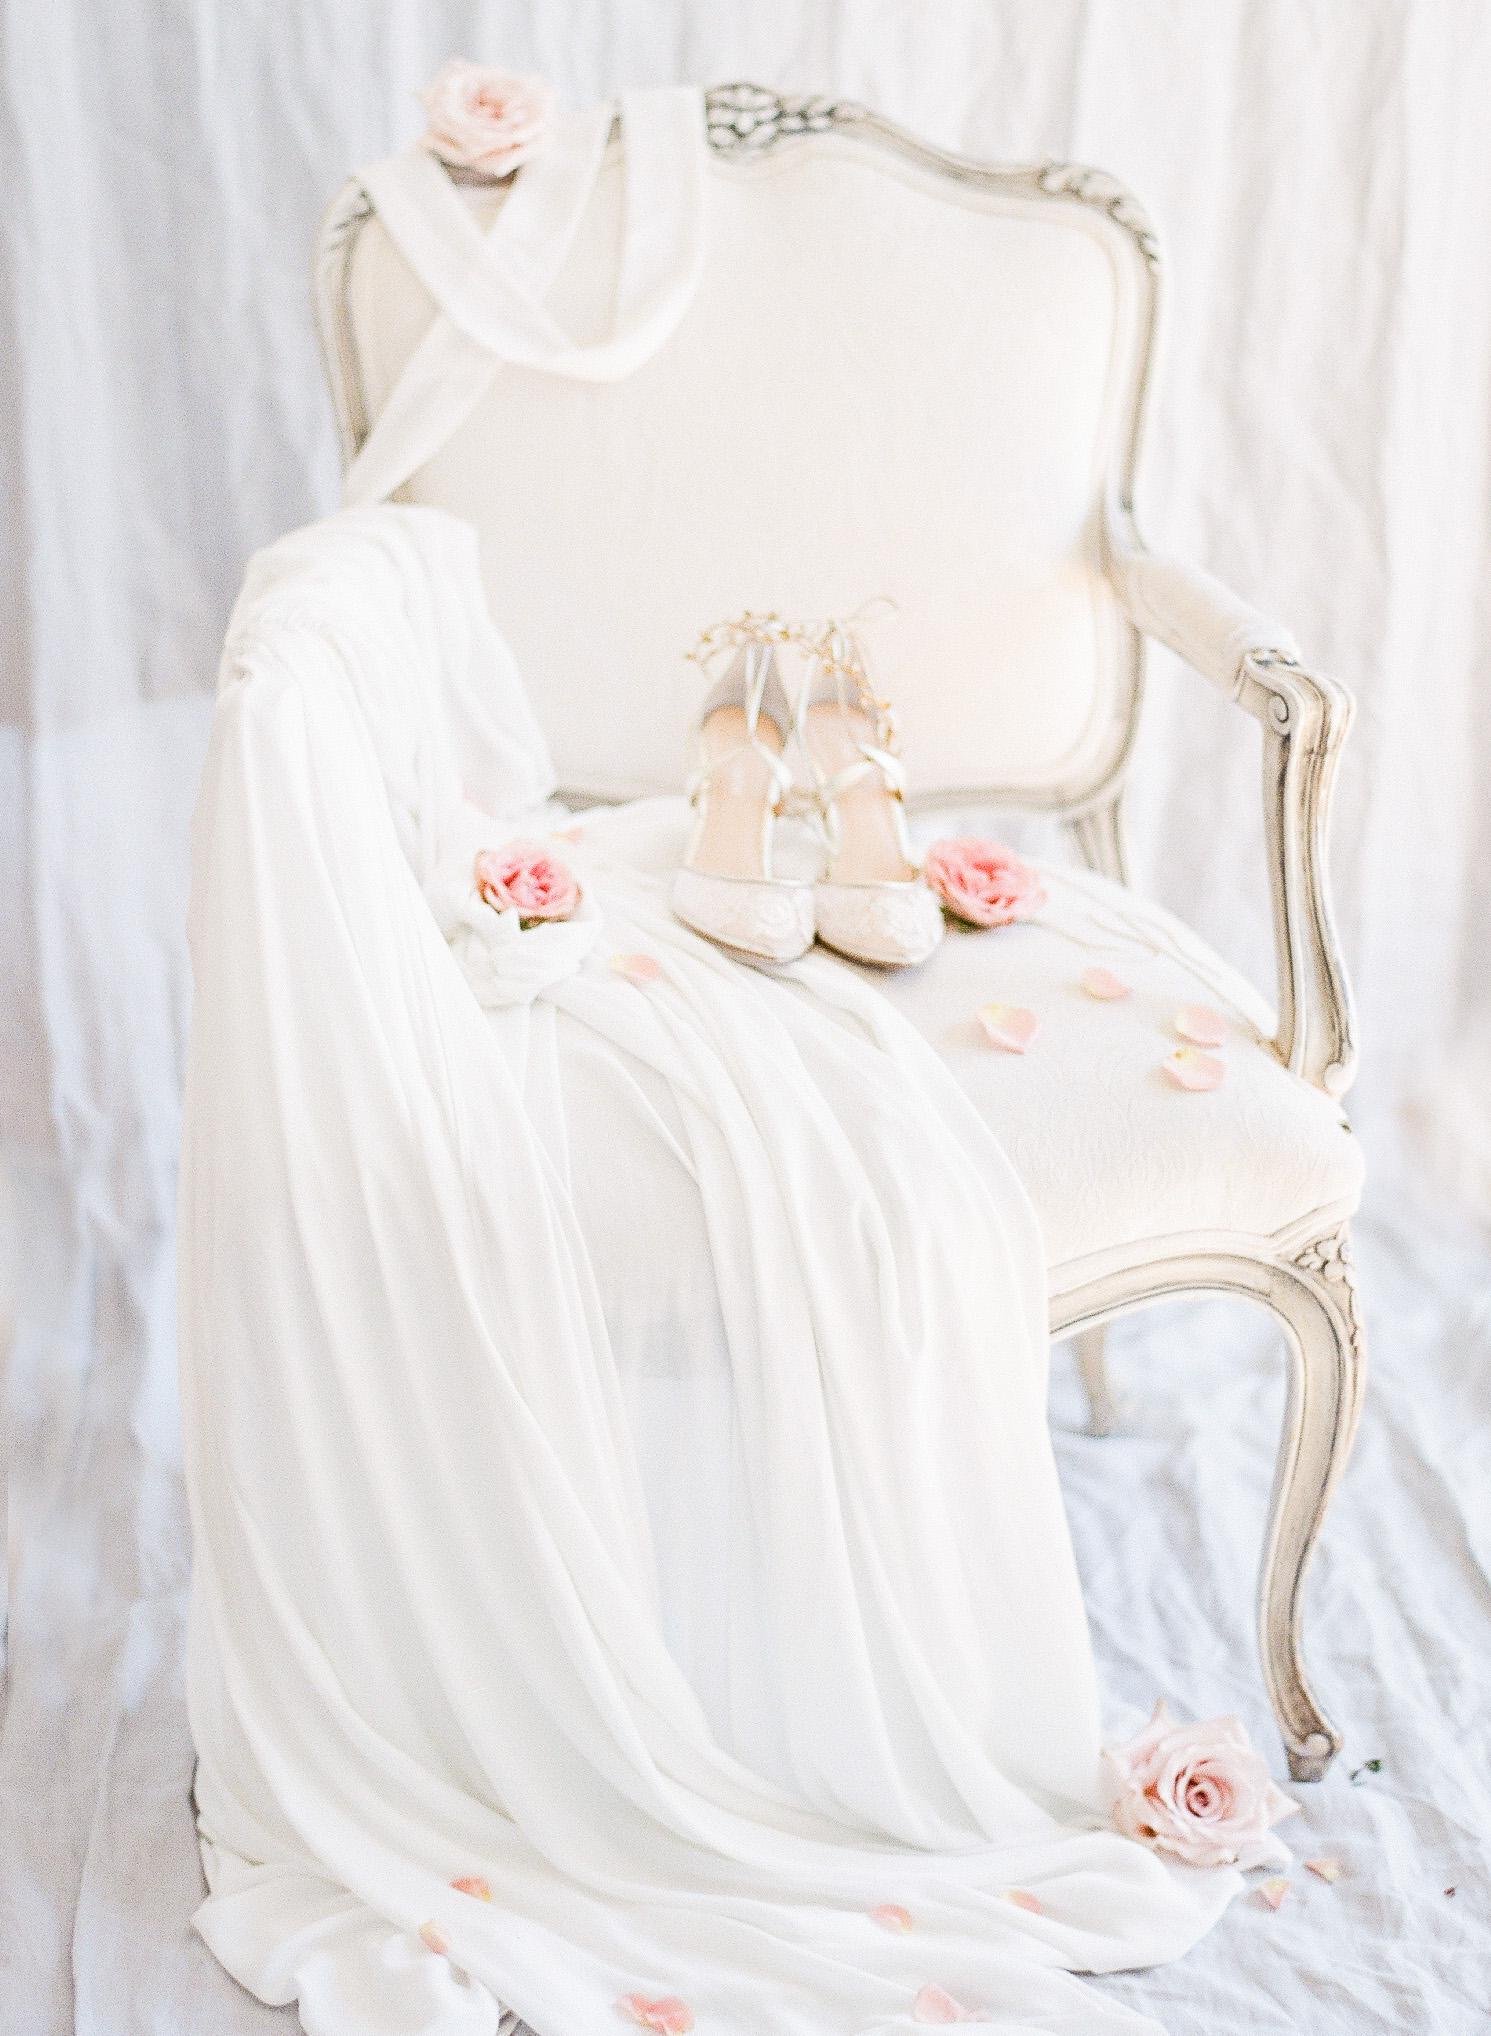 JennySoiPhotography-BridalBoudoireditorial-105.jpg